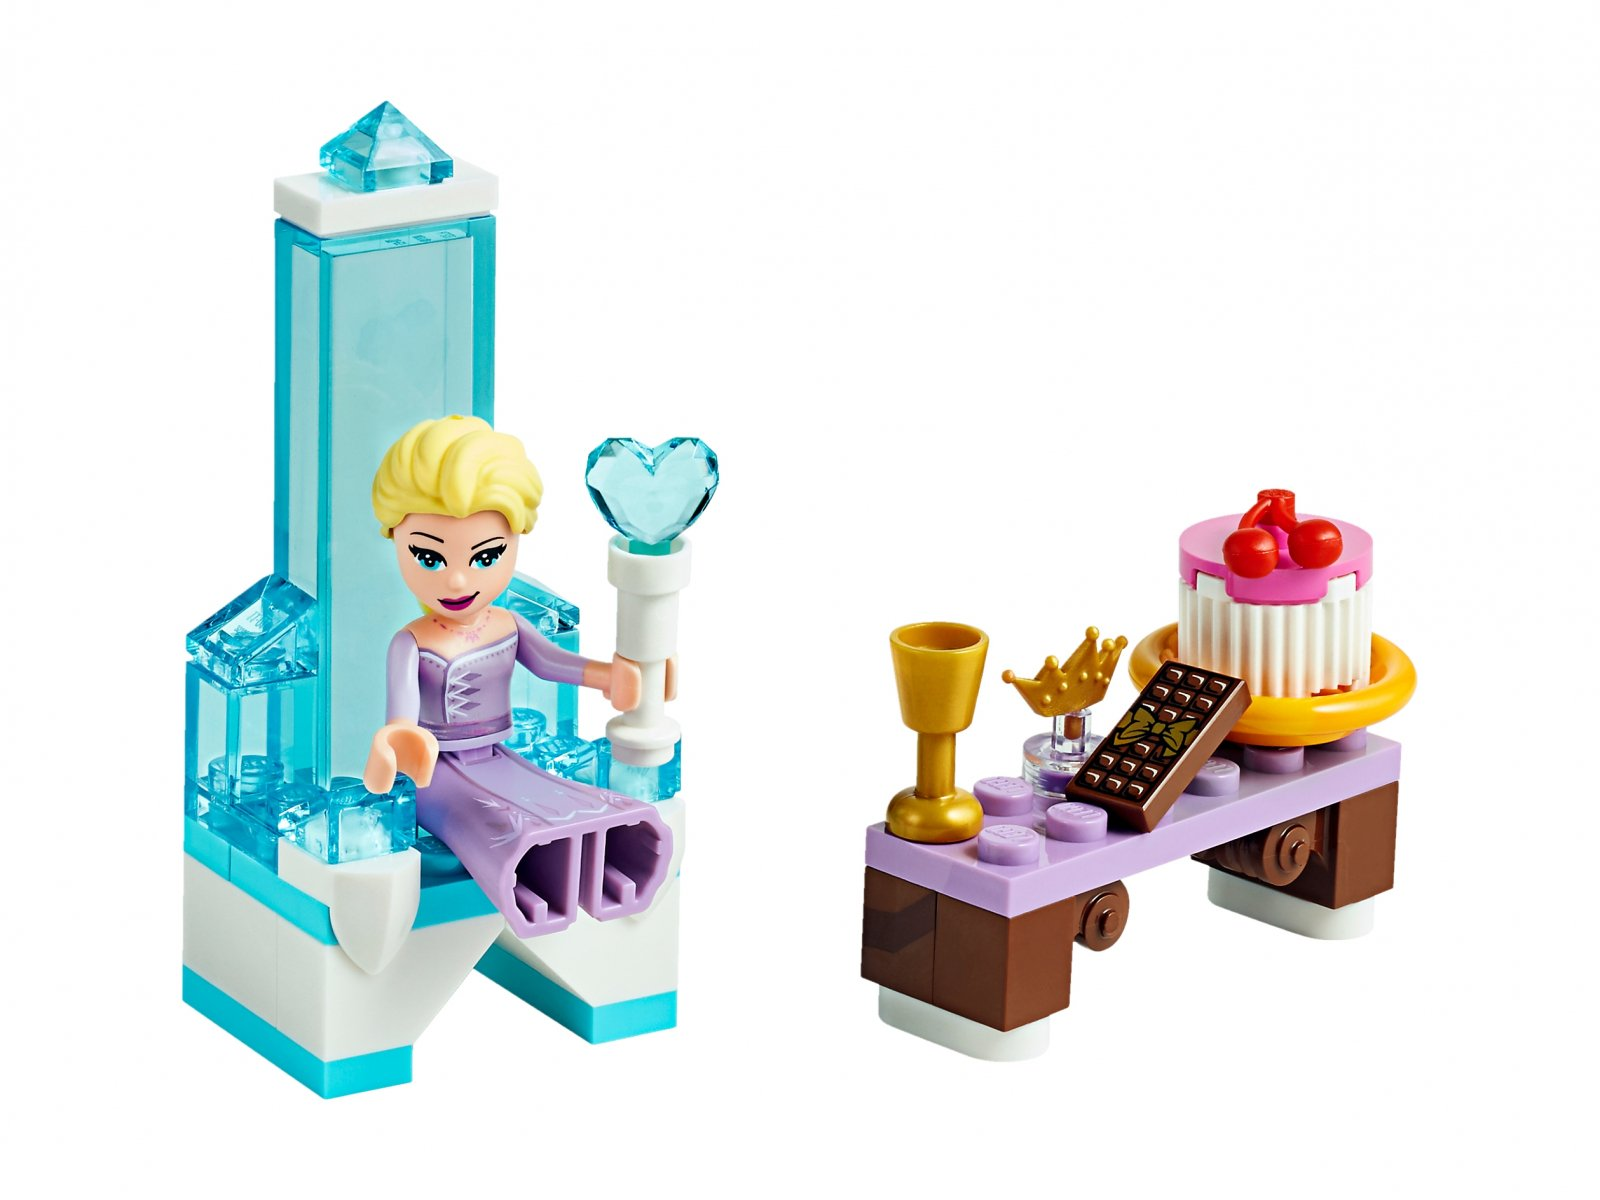 LEGO 30553 Elsa's Winter Throne